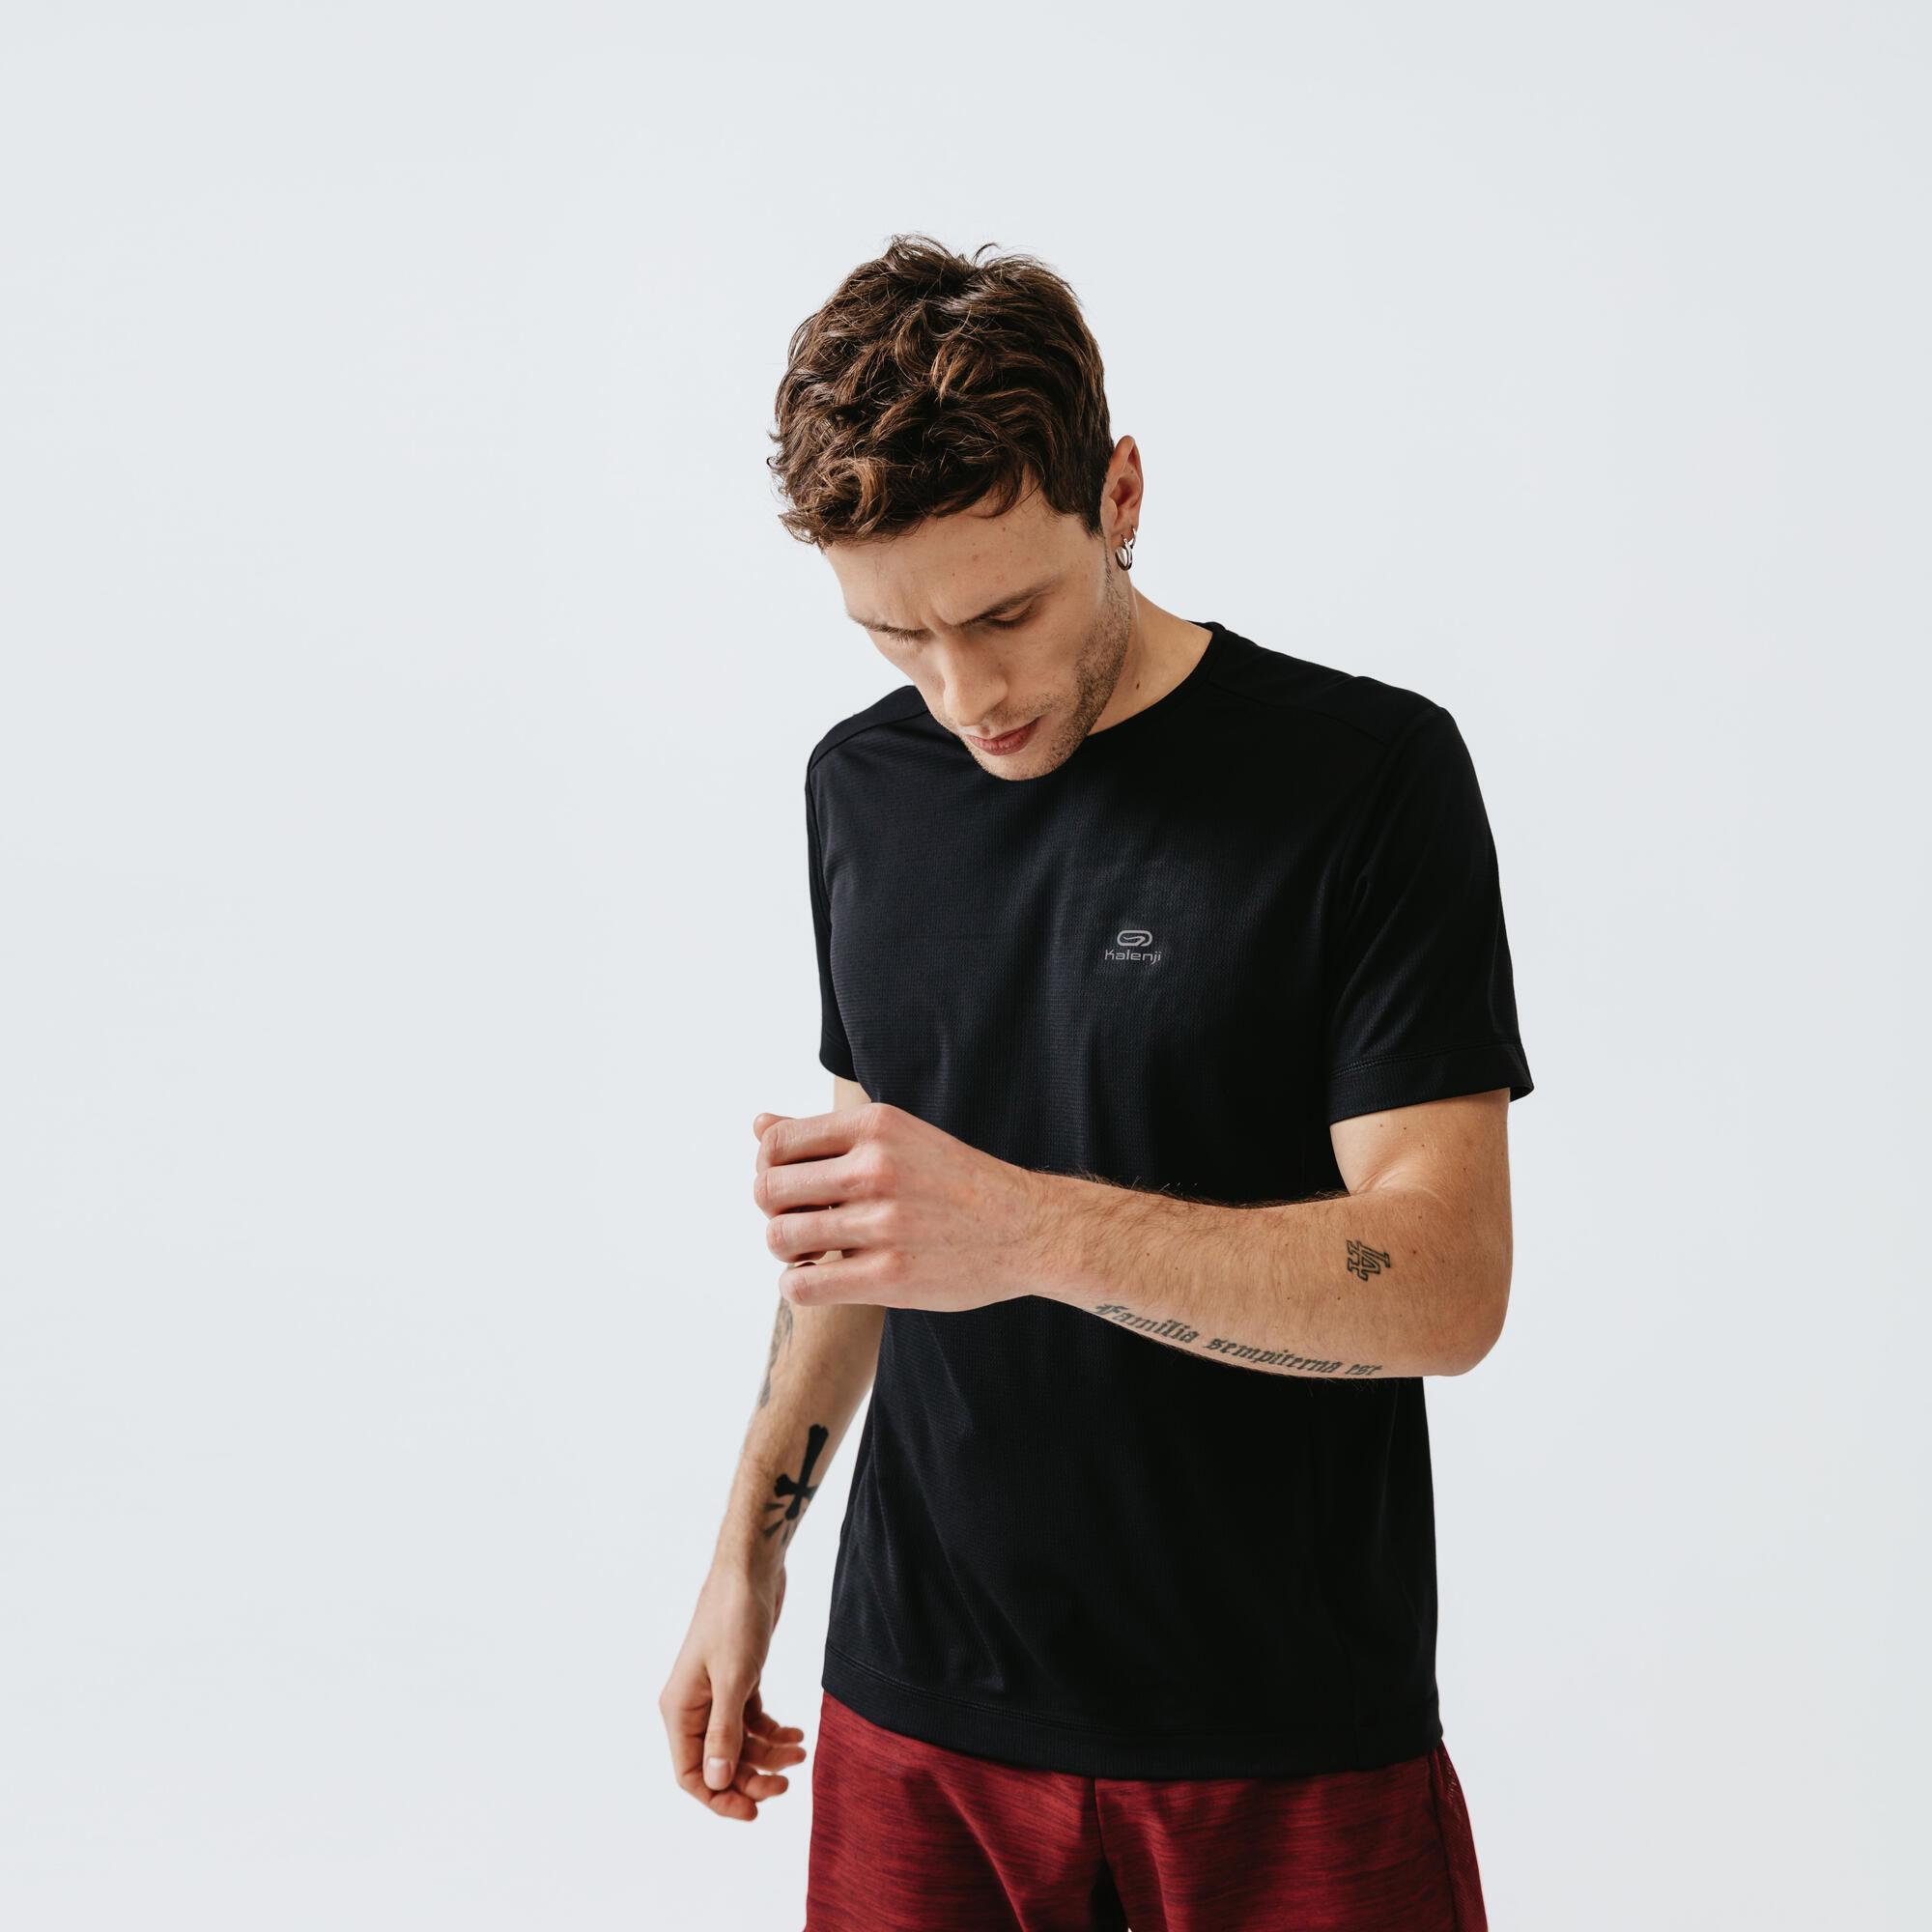 Koszulka Do Biegania Dry Męska